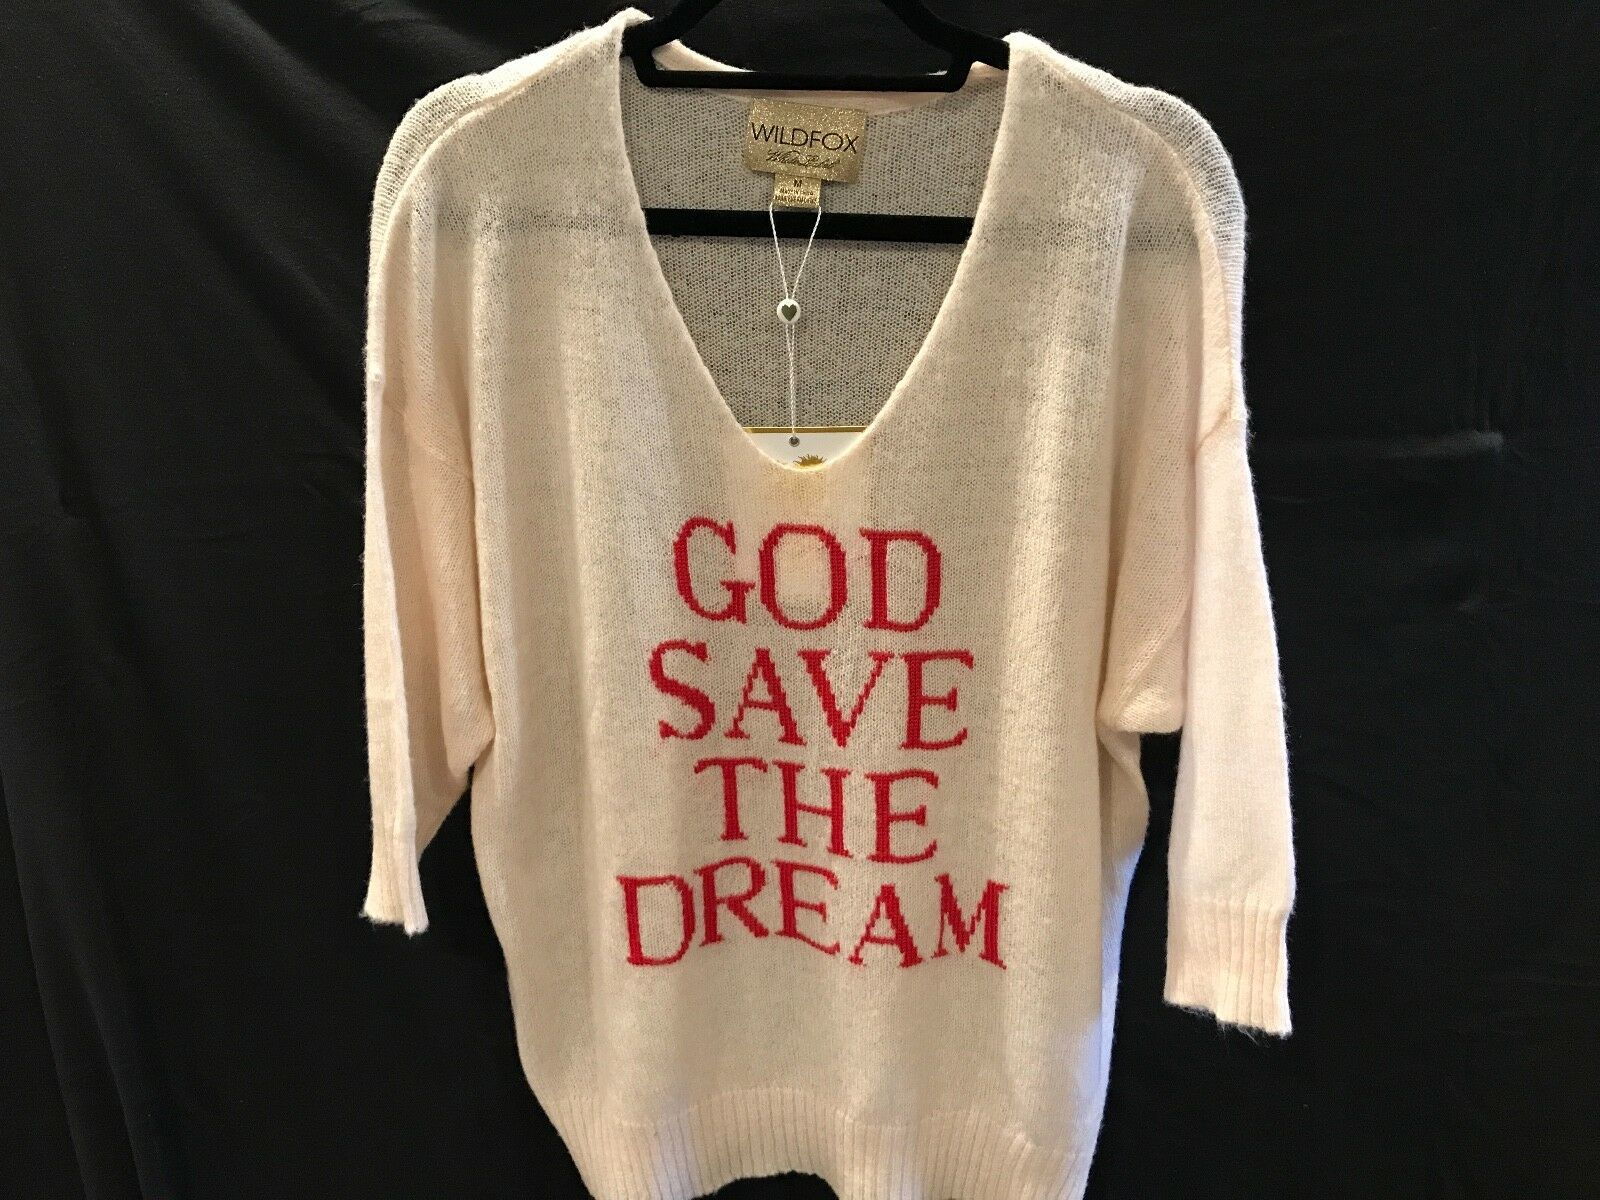 Brand New WILDFOX Weiß Label Woherren 3 4 Sweater  God Save The Dream  Sz Medium